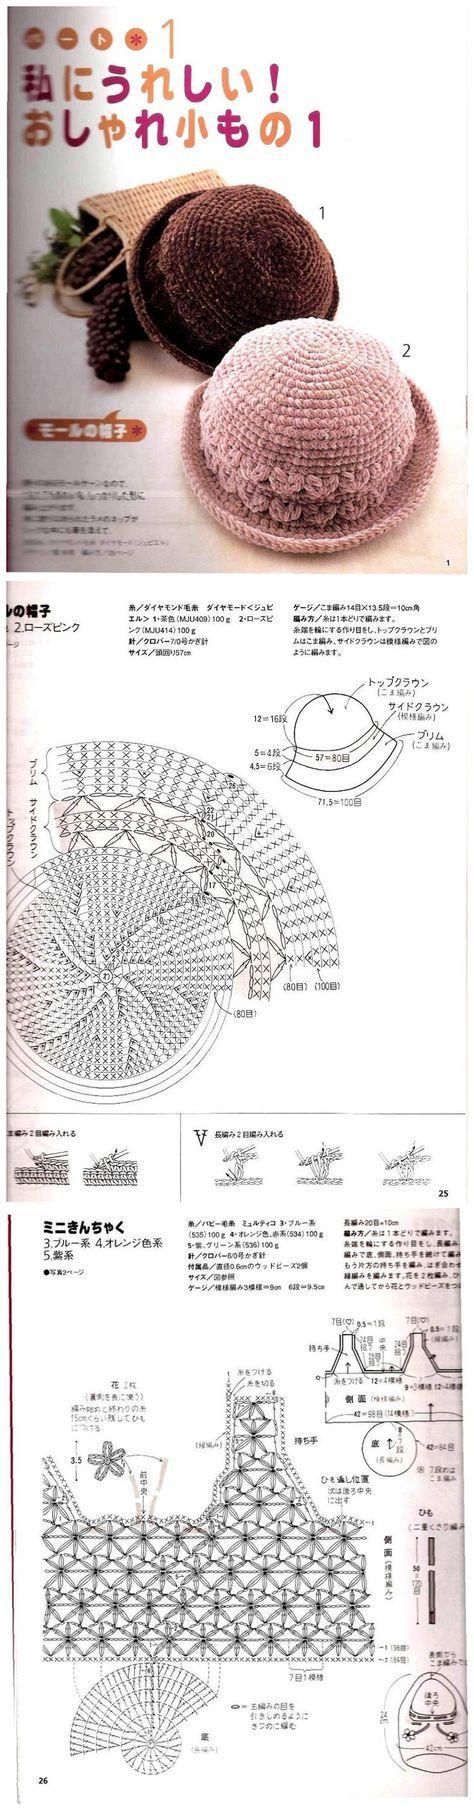 691 best Шапочки images on Pinterest | Crochet hats, Crochet ...